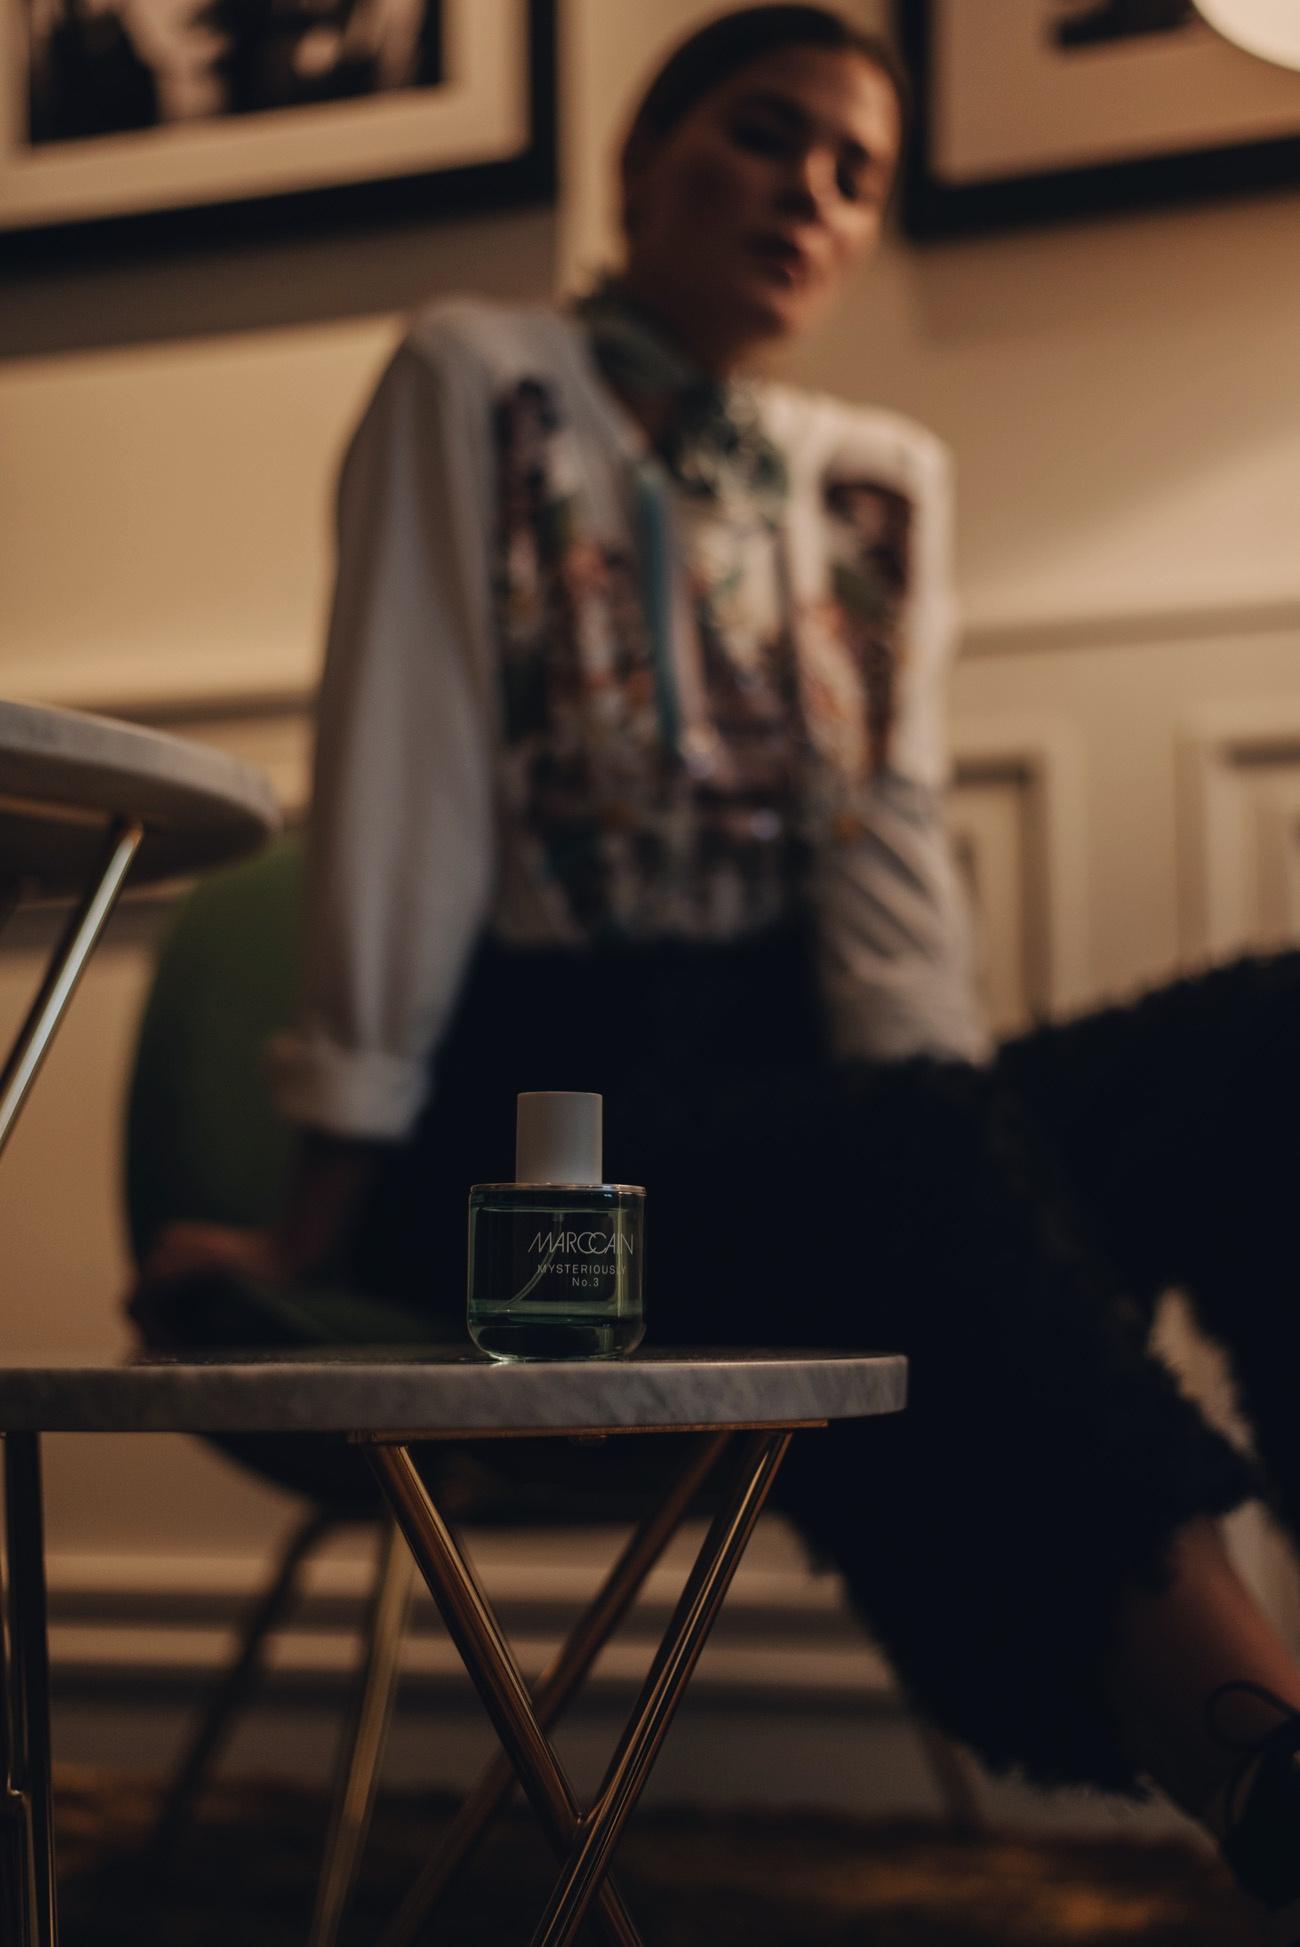 Parfum-Linie-Marc-Cain-Mysteriously-Beauty-Blogger-Fashionblogger-München-Nina-Schwichtenberg-fashiioncarpet